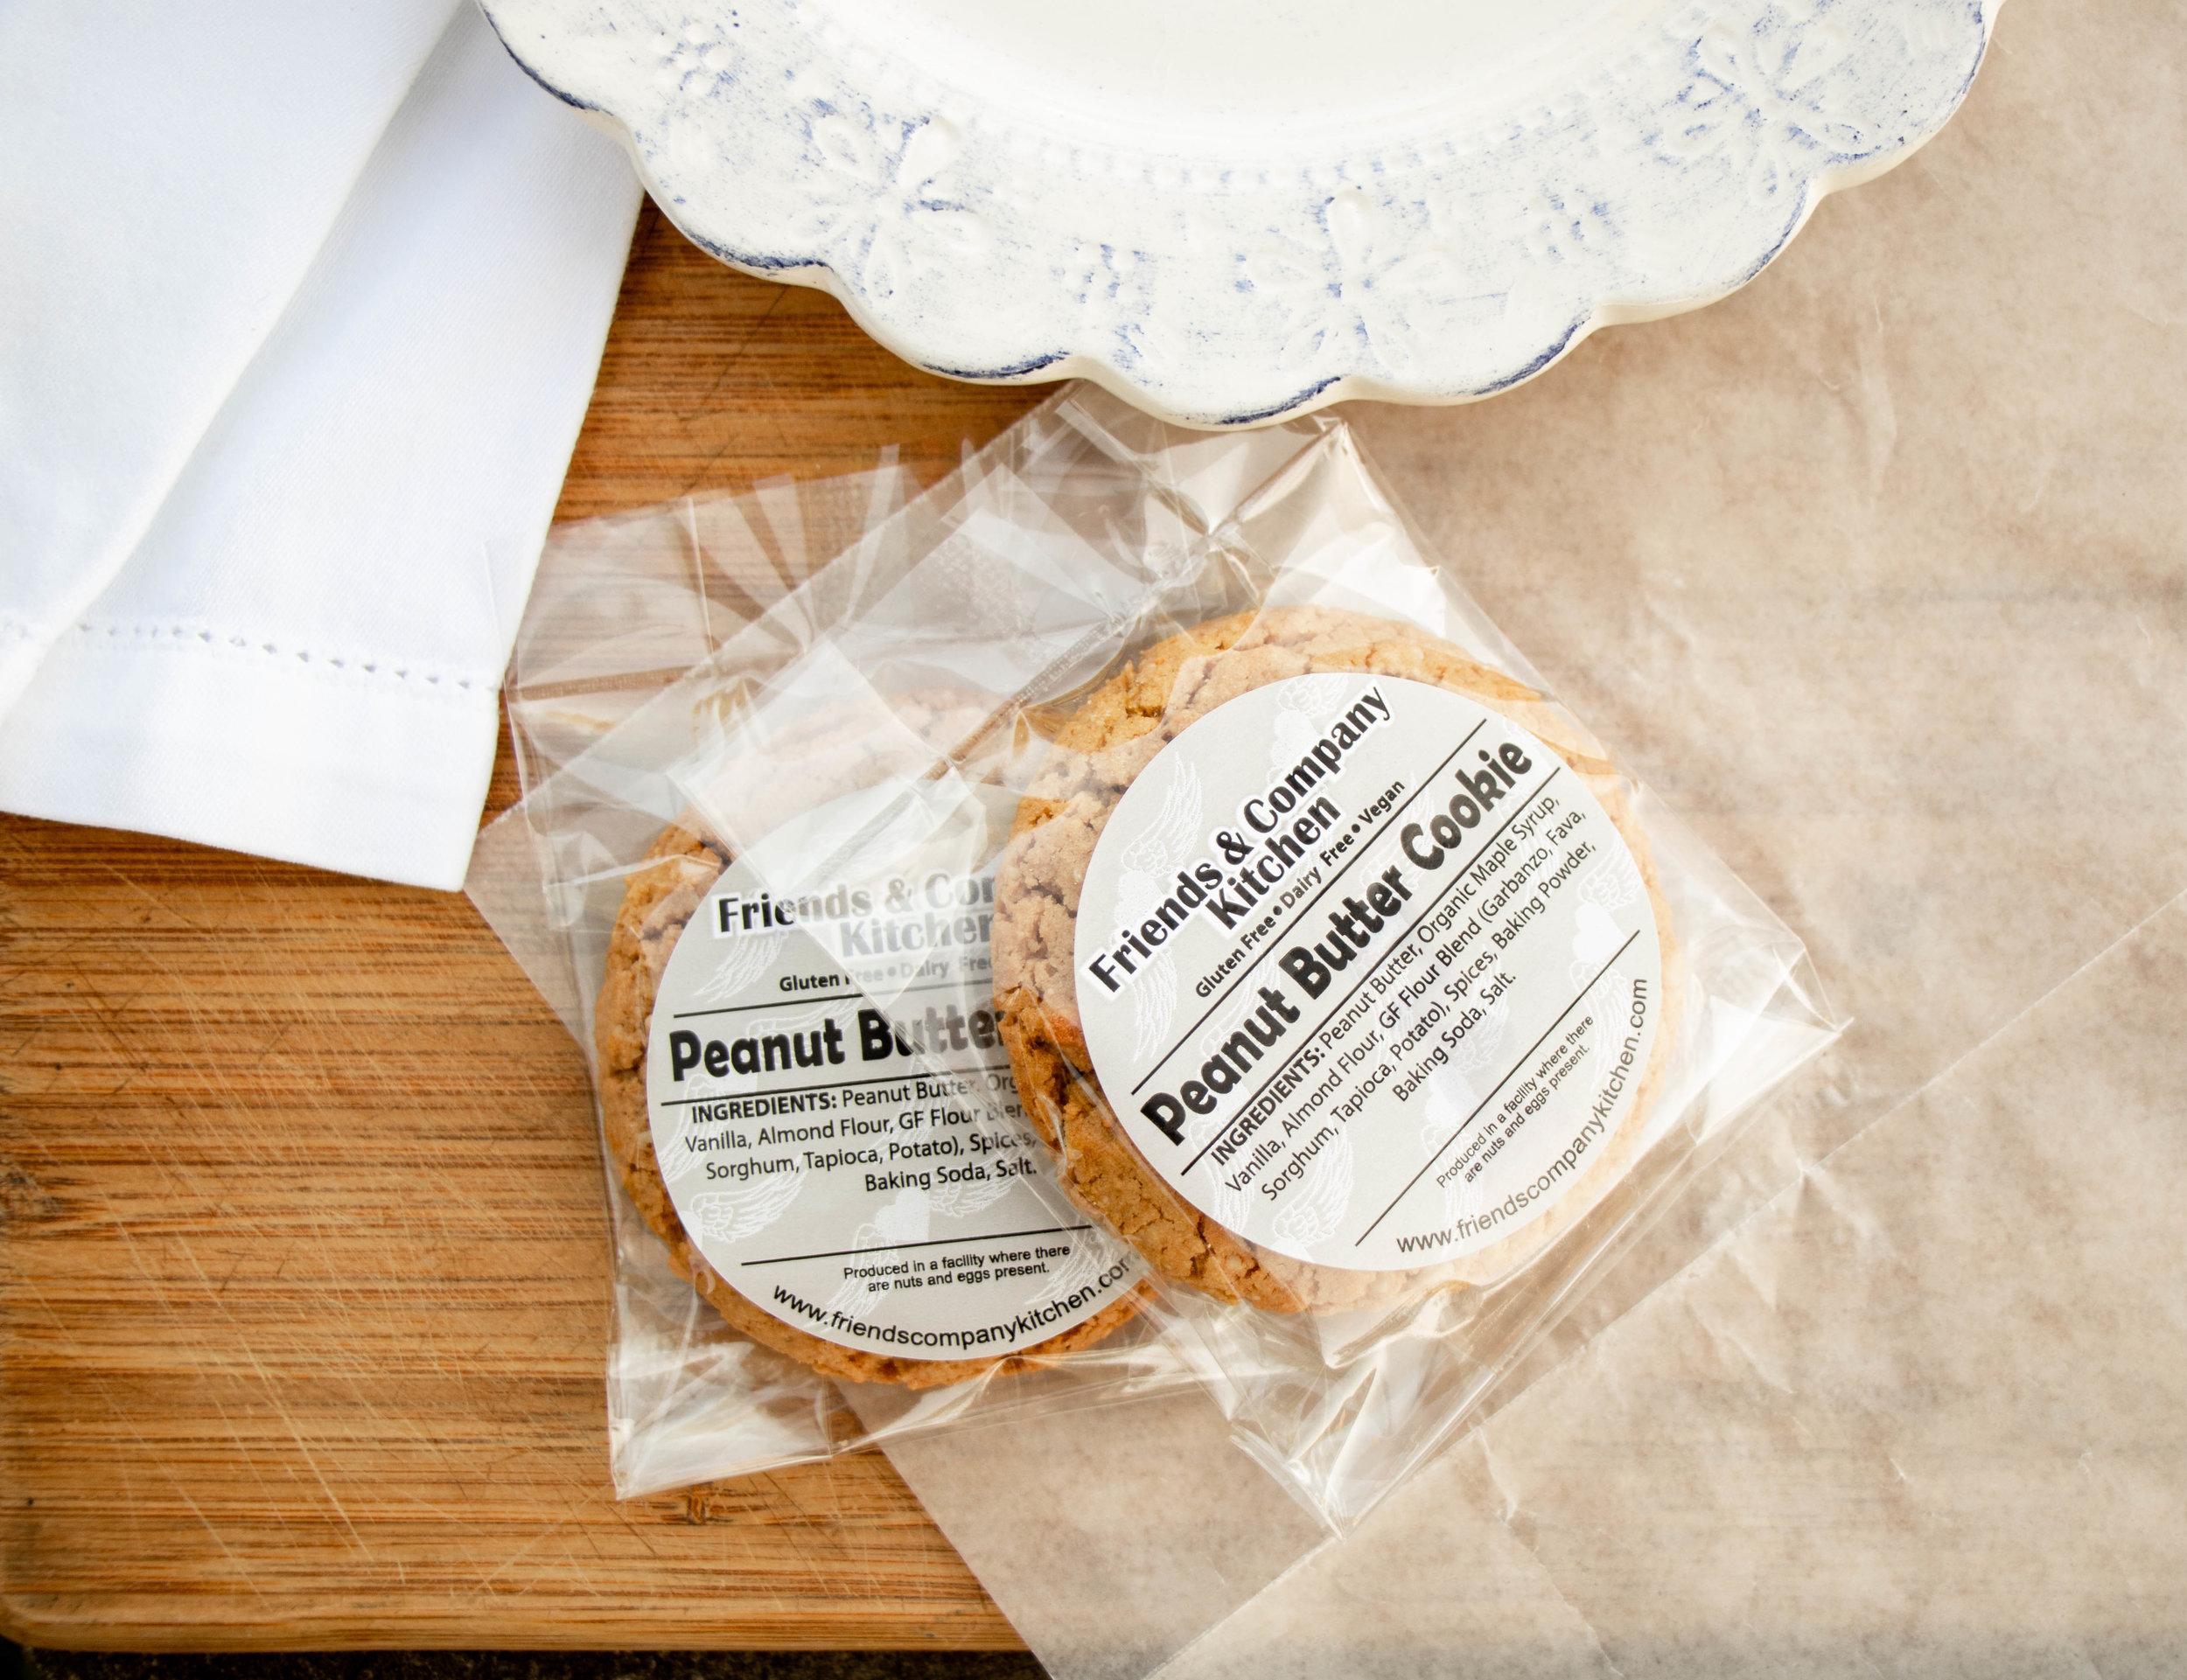 Friends & Company Kitchen Peanut Butter Cookies